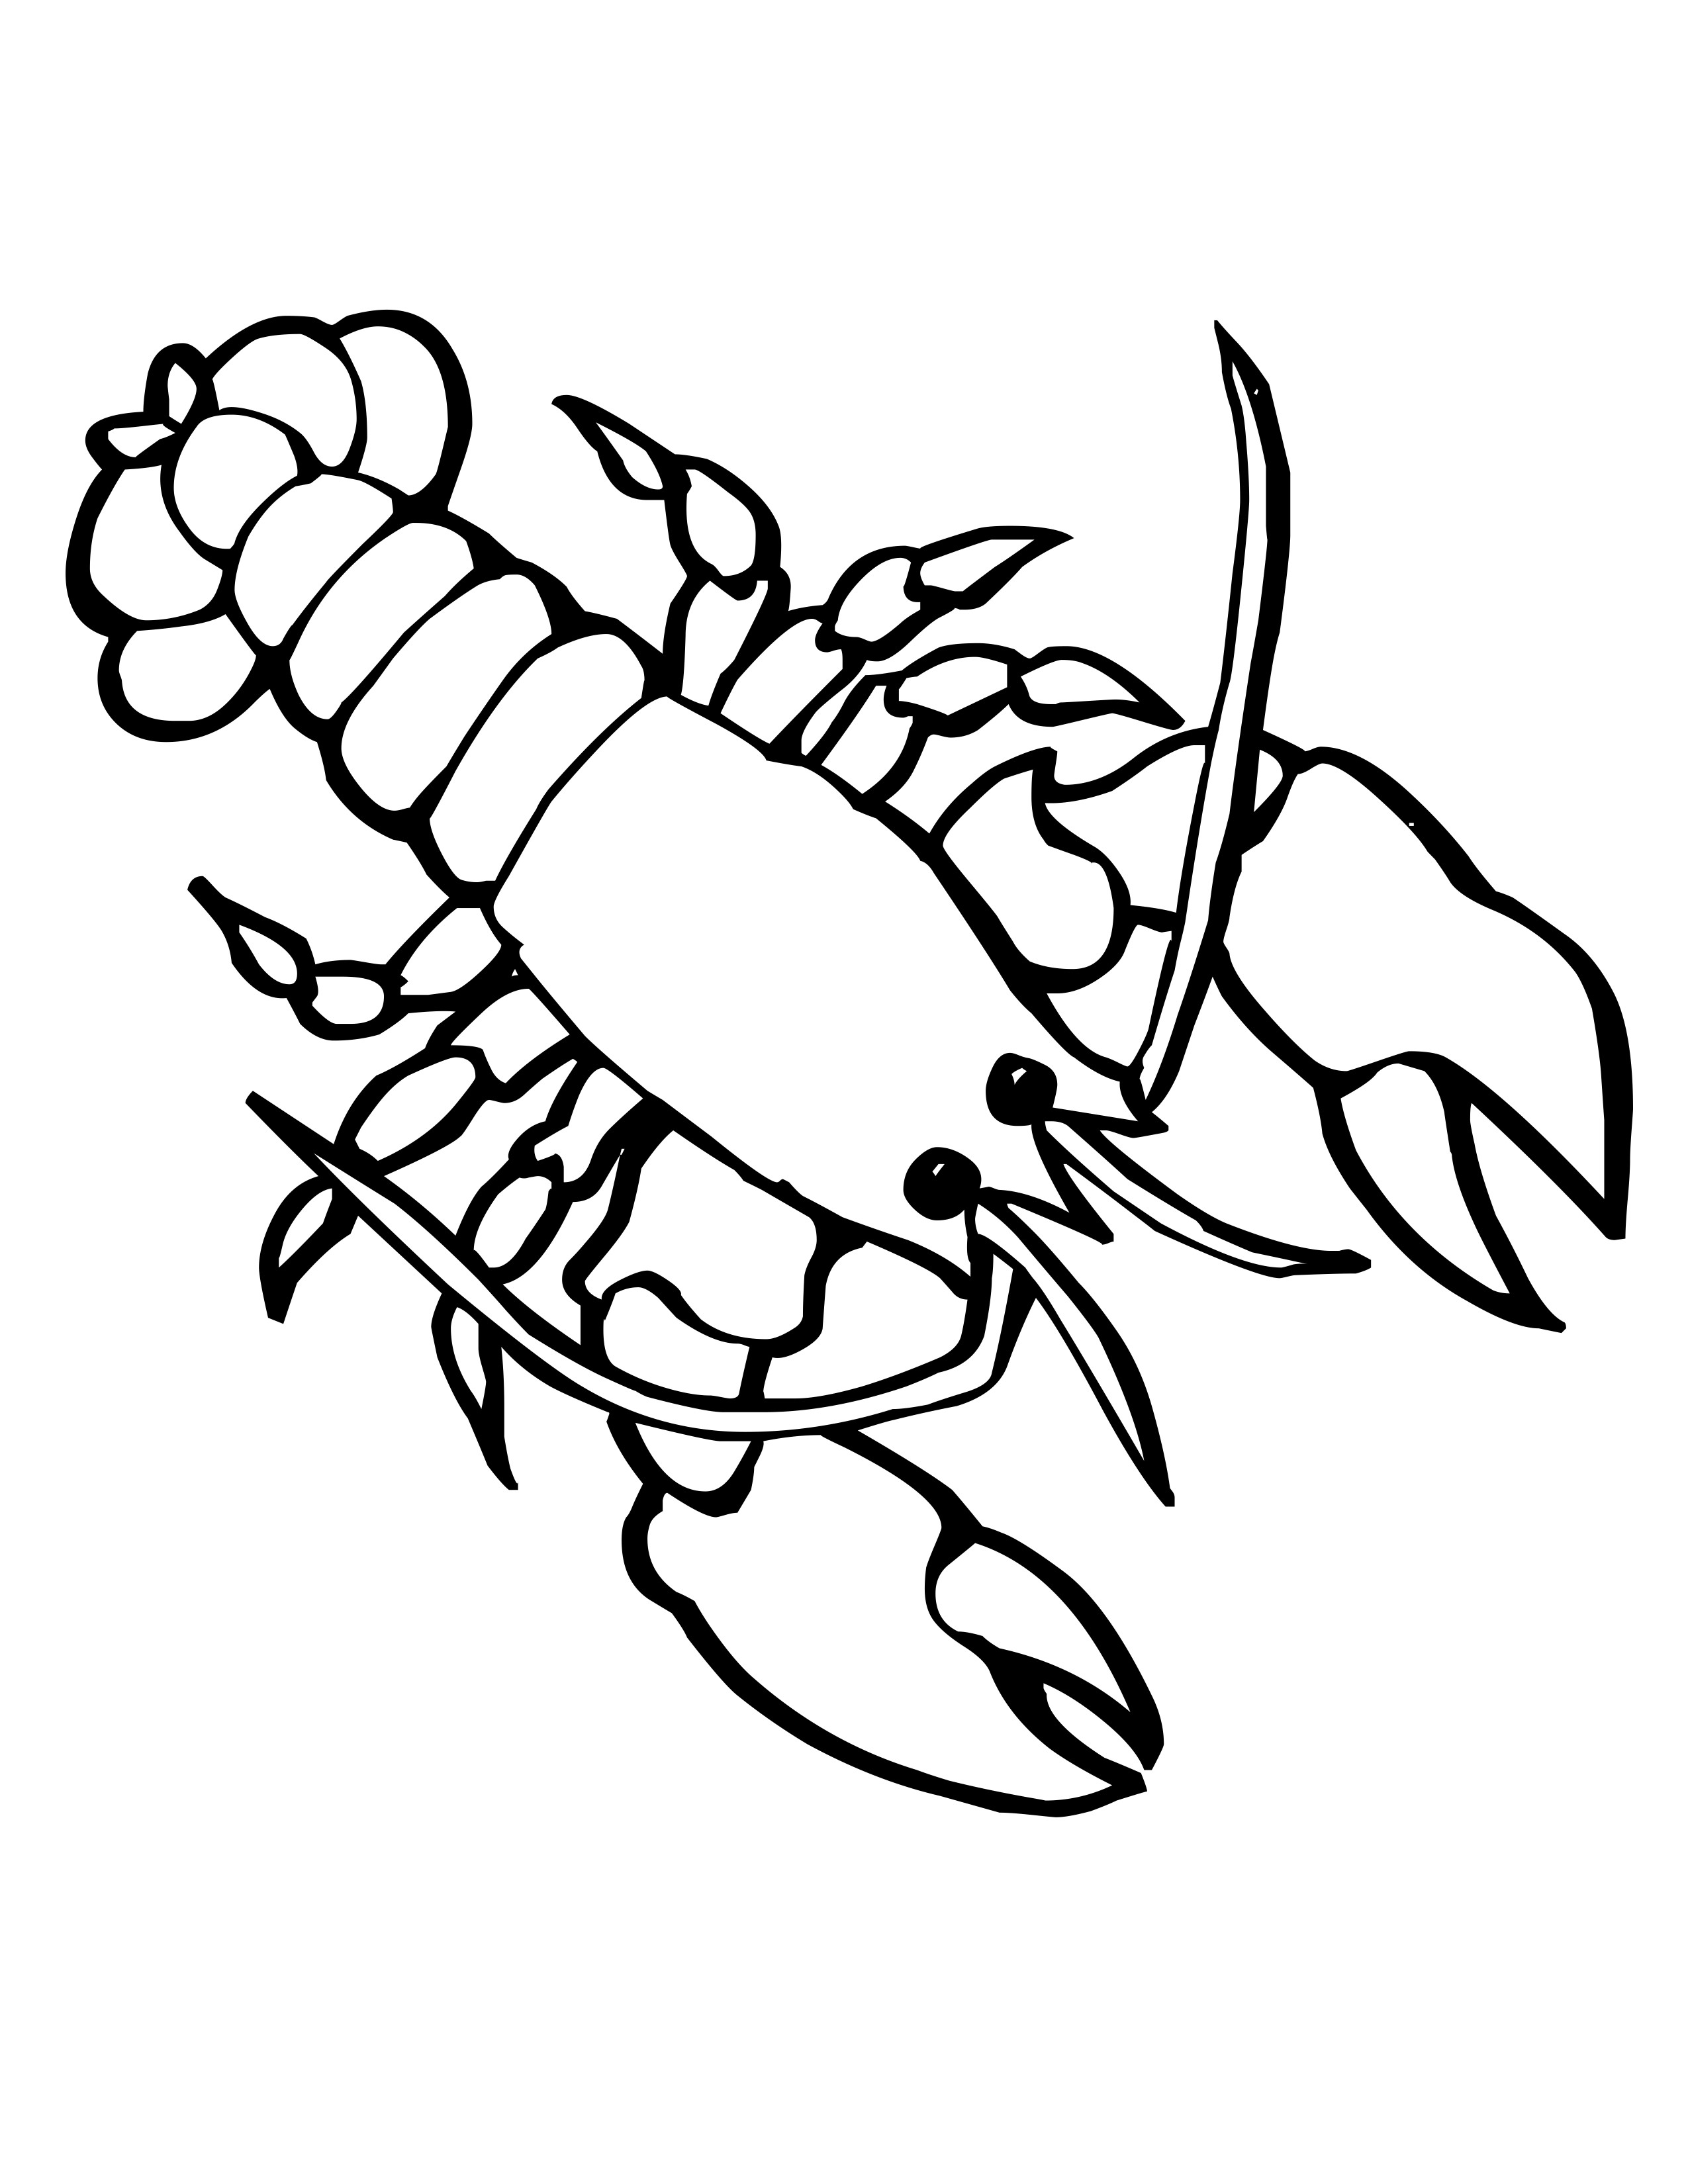 Drawn sea life aquatic animal Colour Blank underwater 64609 Editable